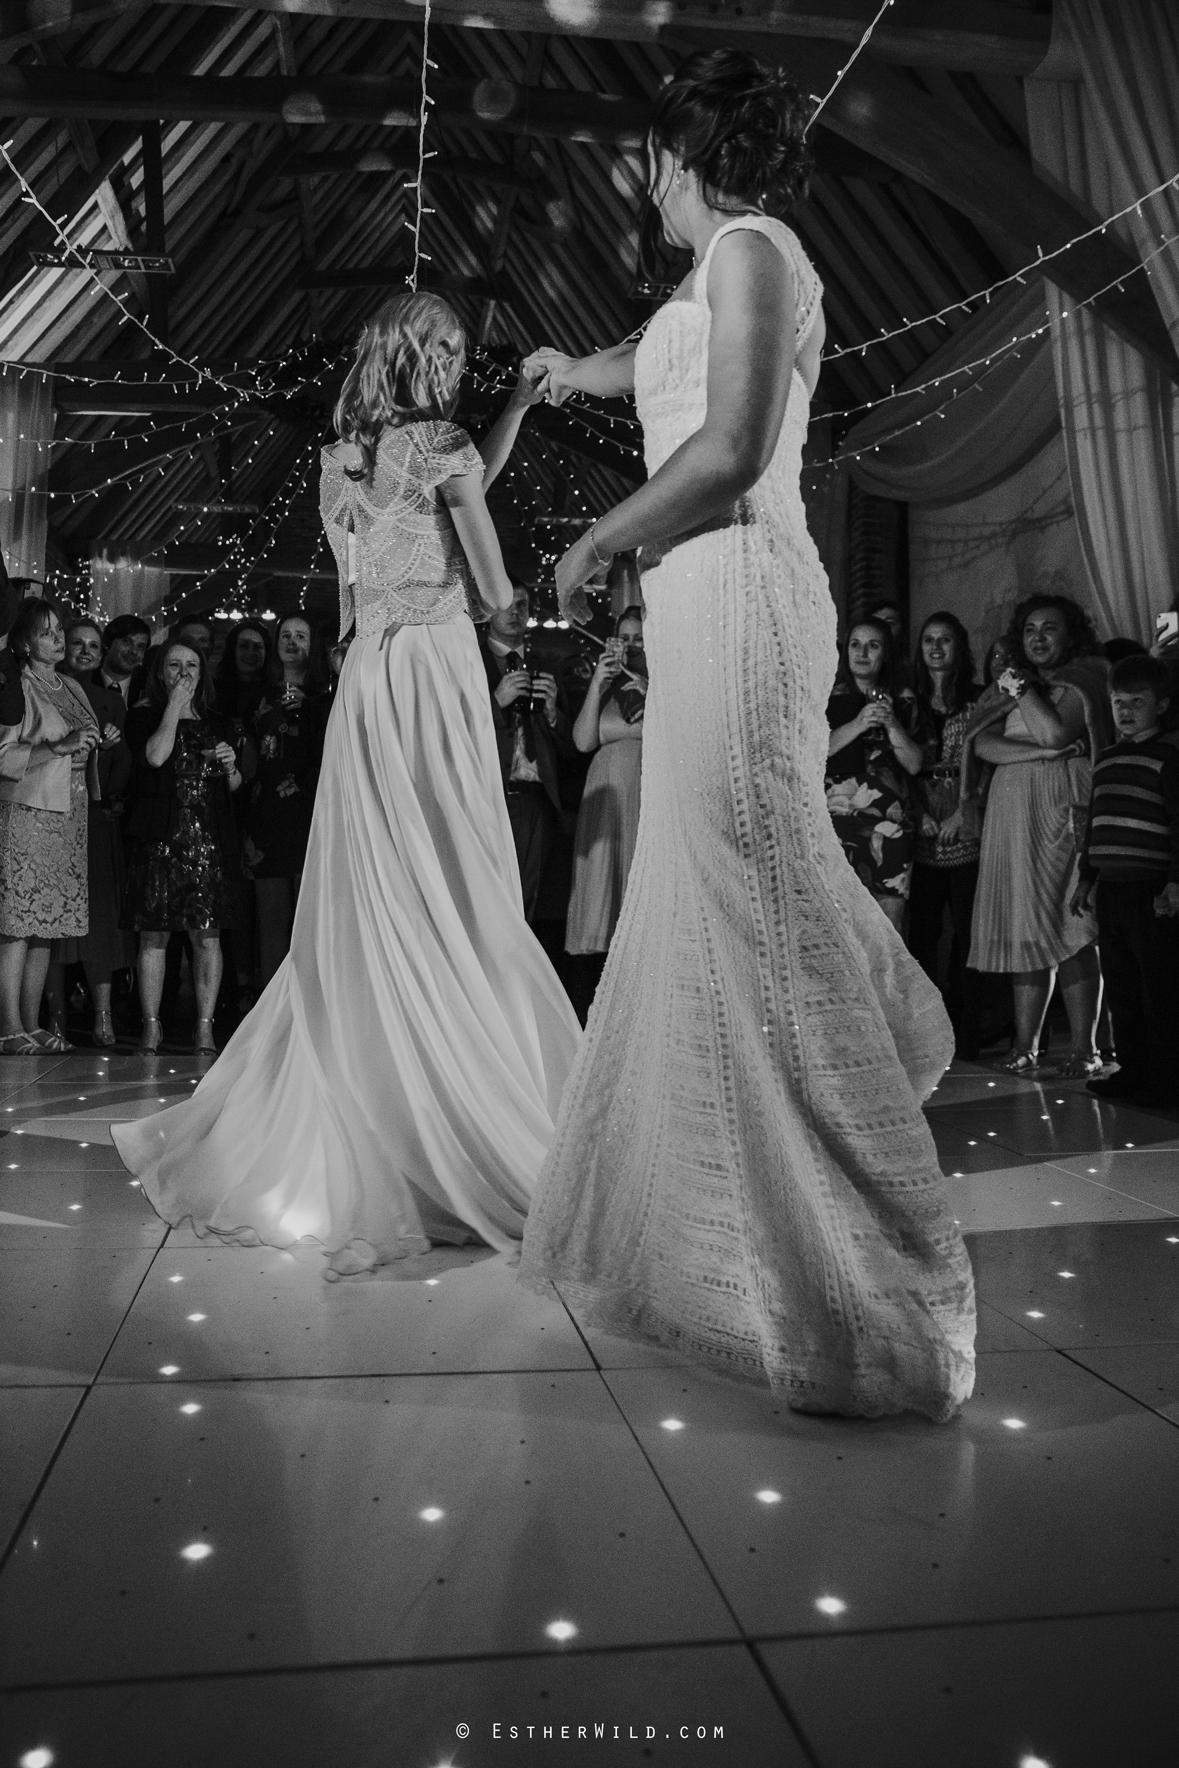 Elms_Barn_Weddings_Suffolk_Photographer_Copyright_Esther_Wild_IMG_3411-2.jpg